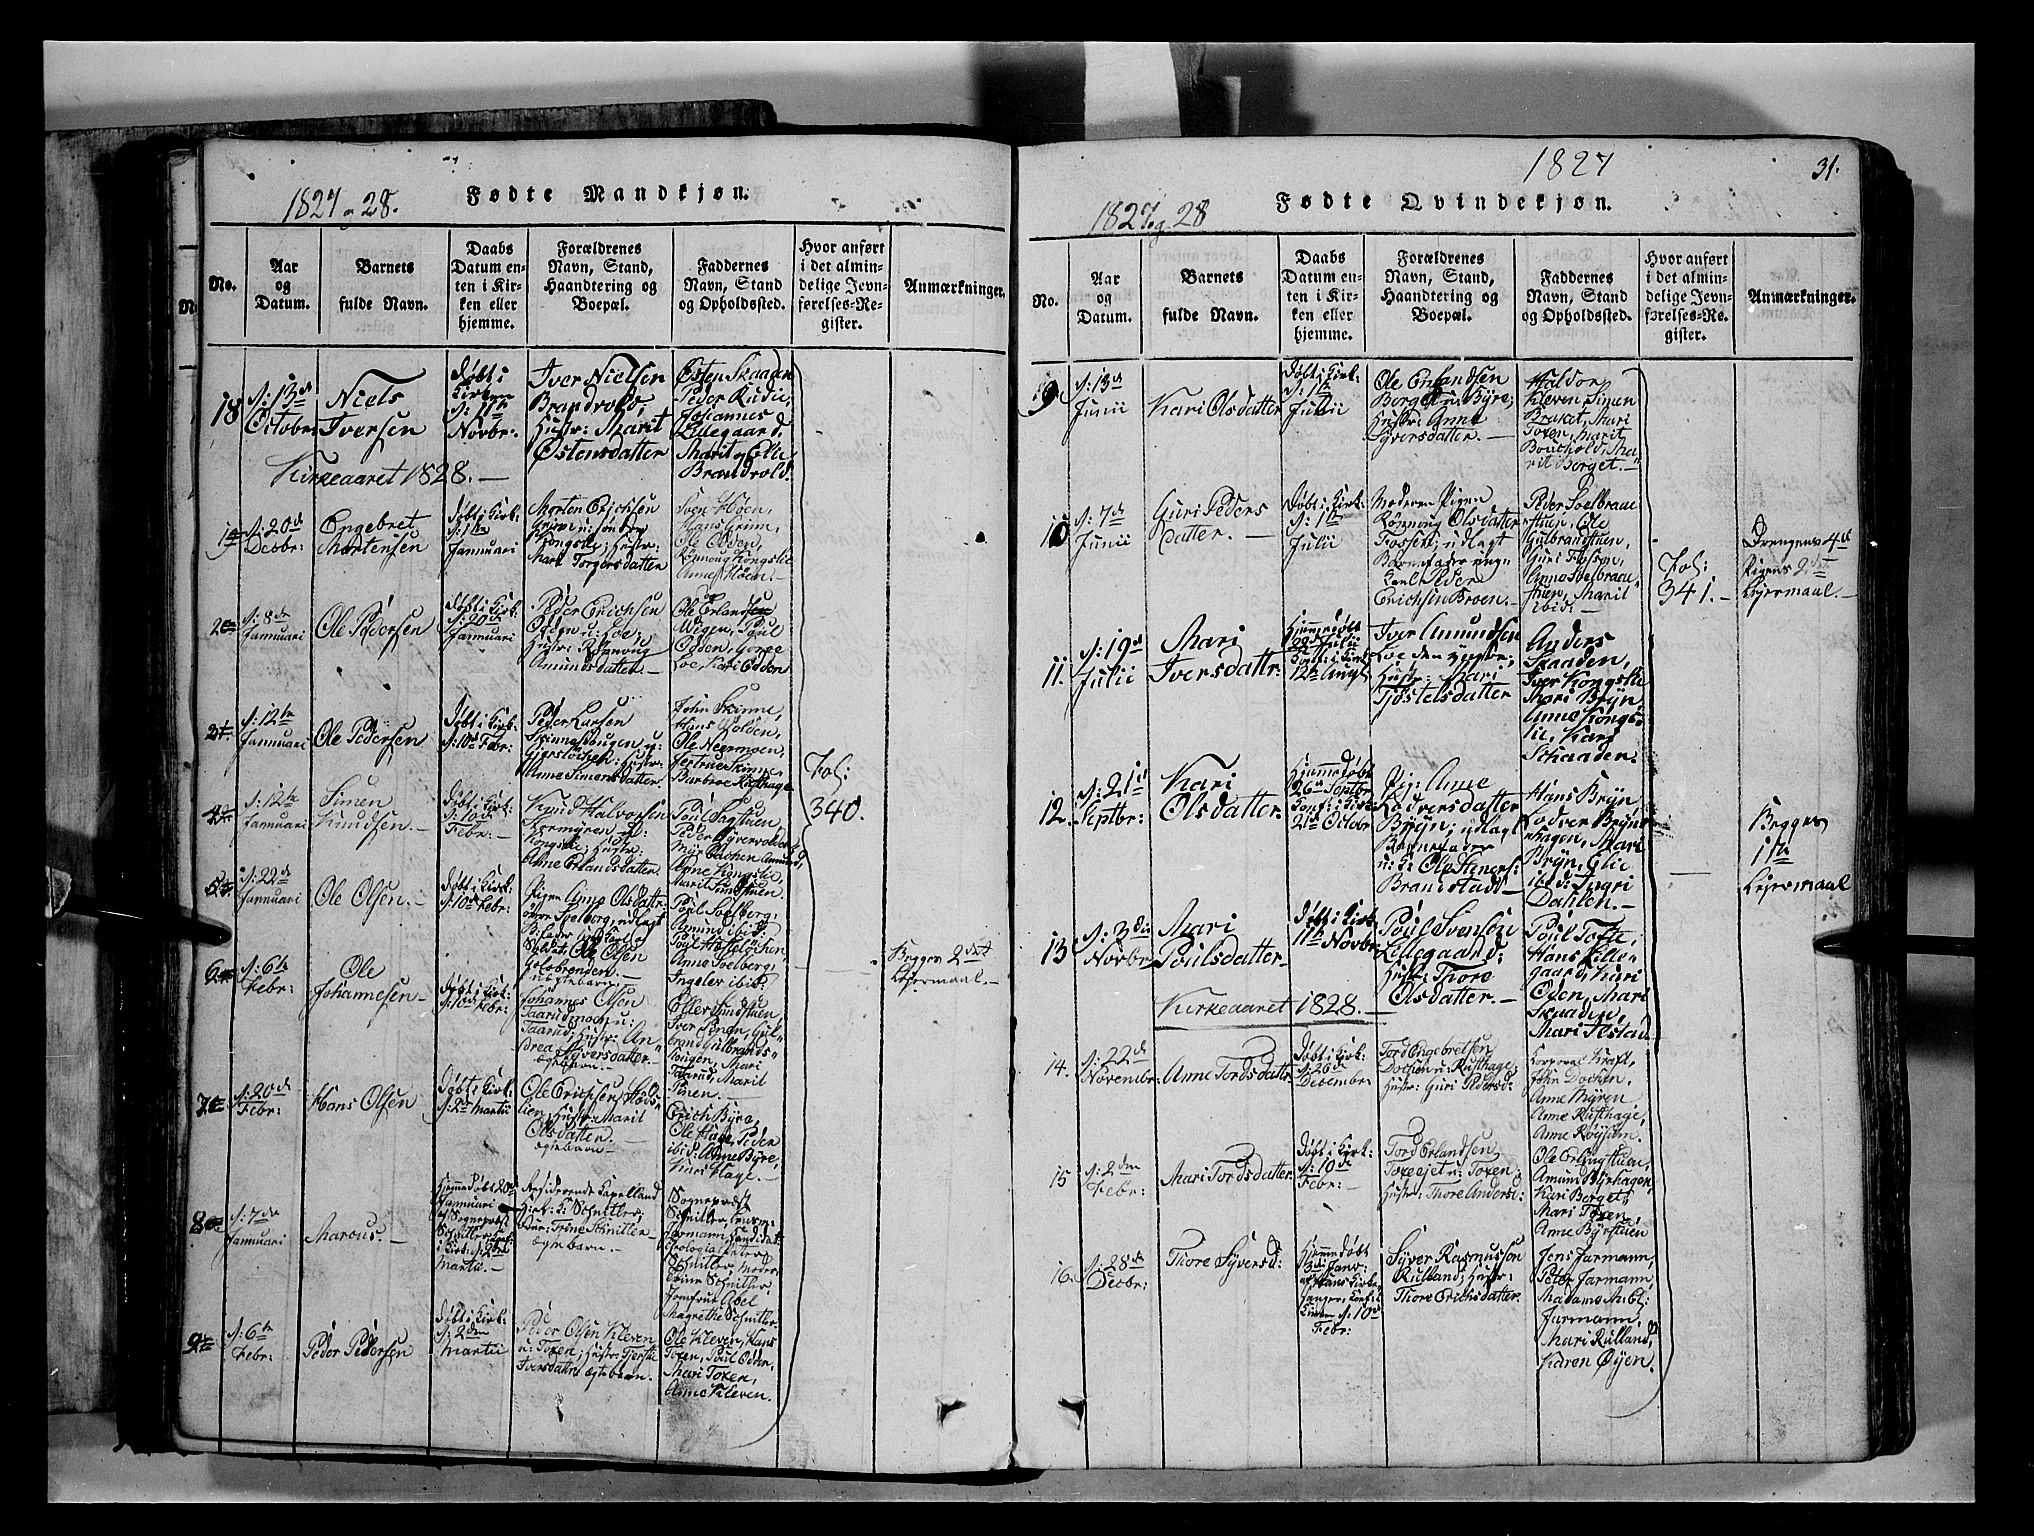 SAH, Fron prestekontor, H/Ha/Hab/L0004: Klokkerbok nr. 4, 1816-1850, s. 31